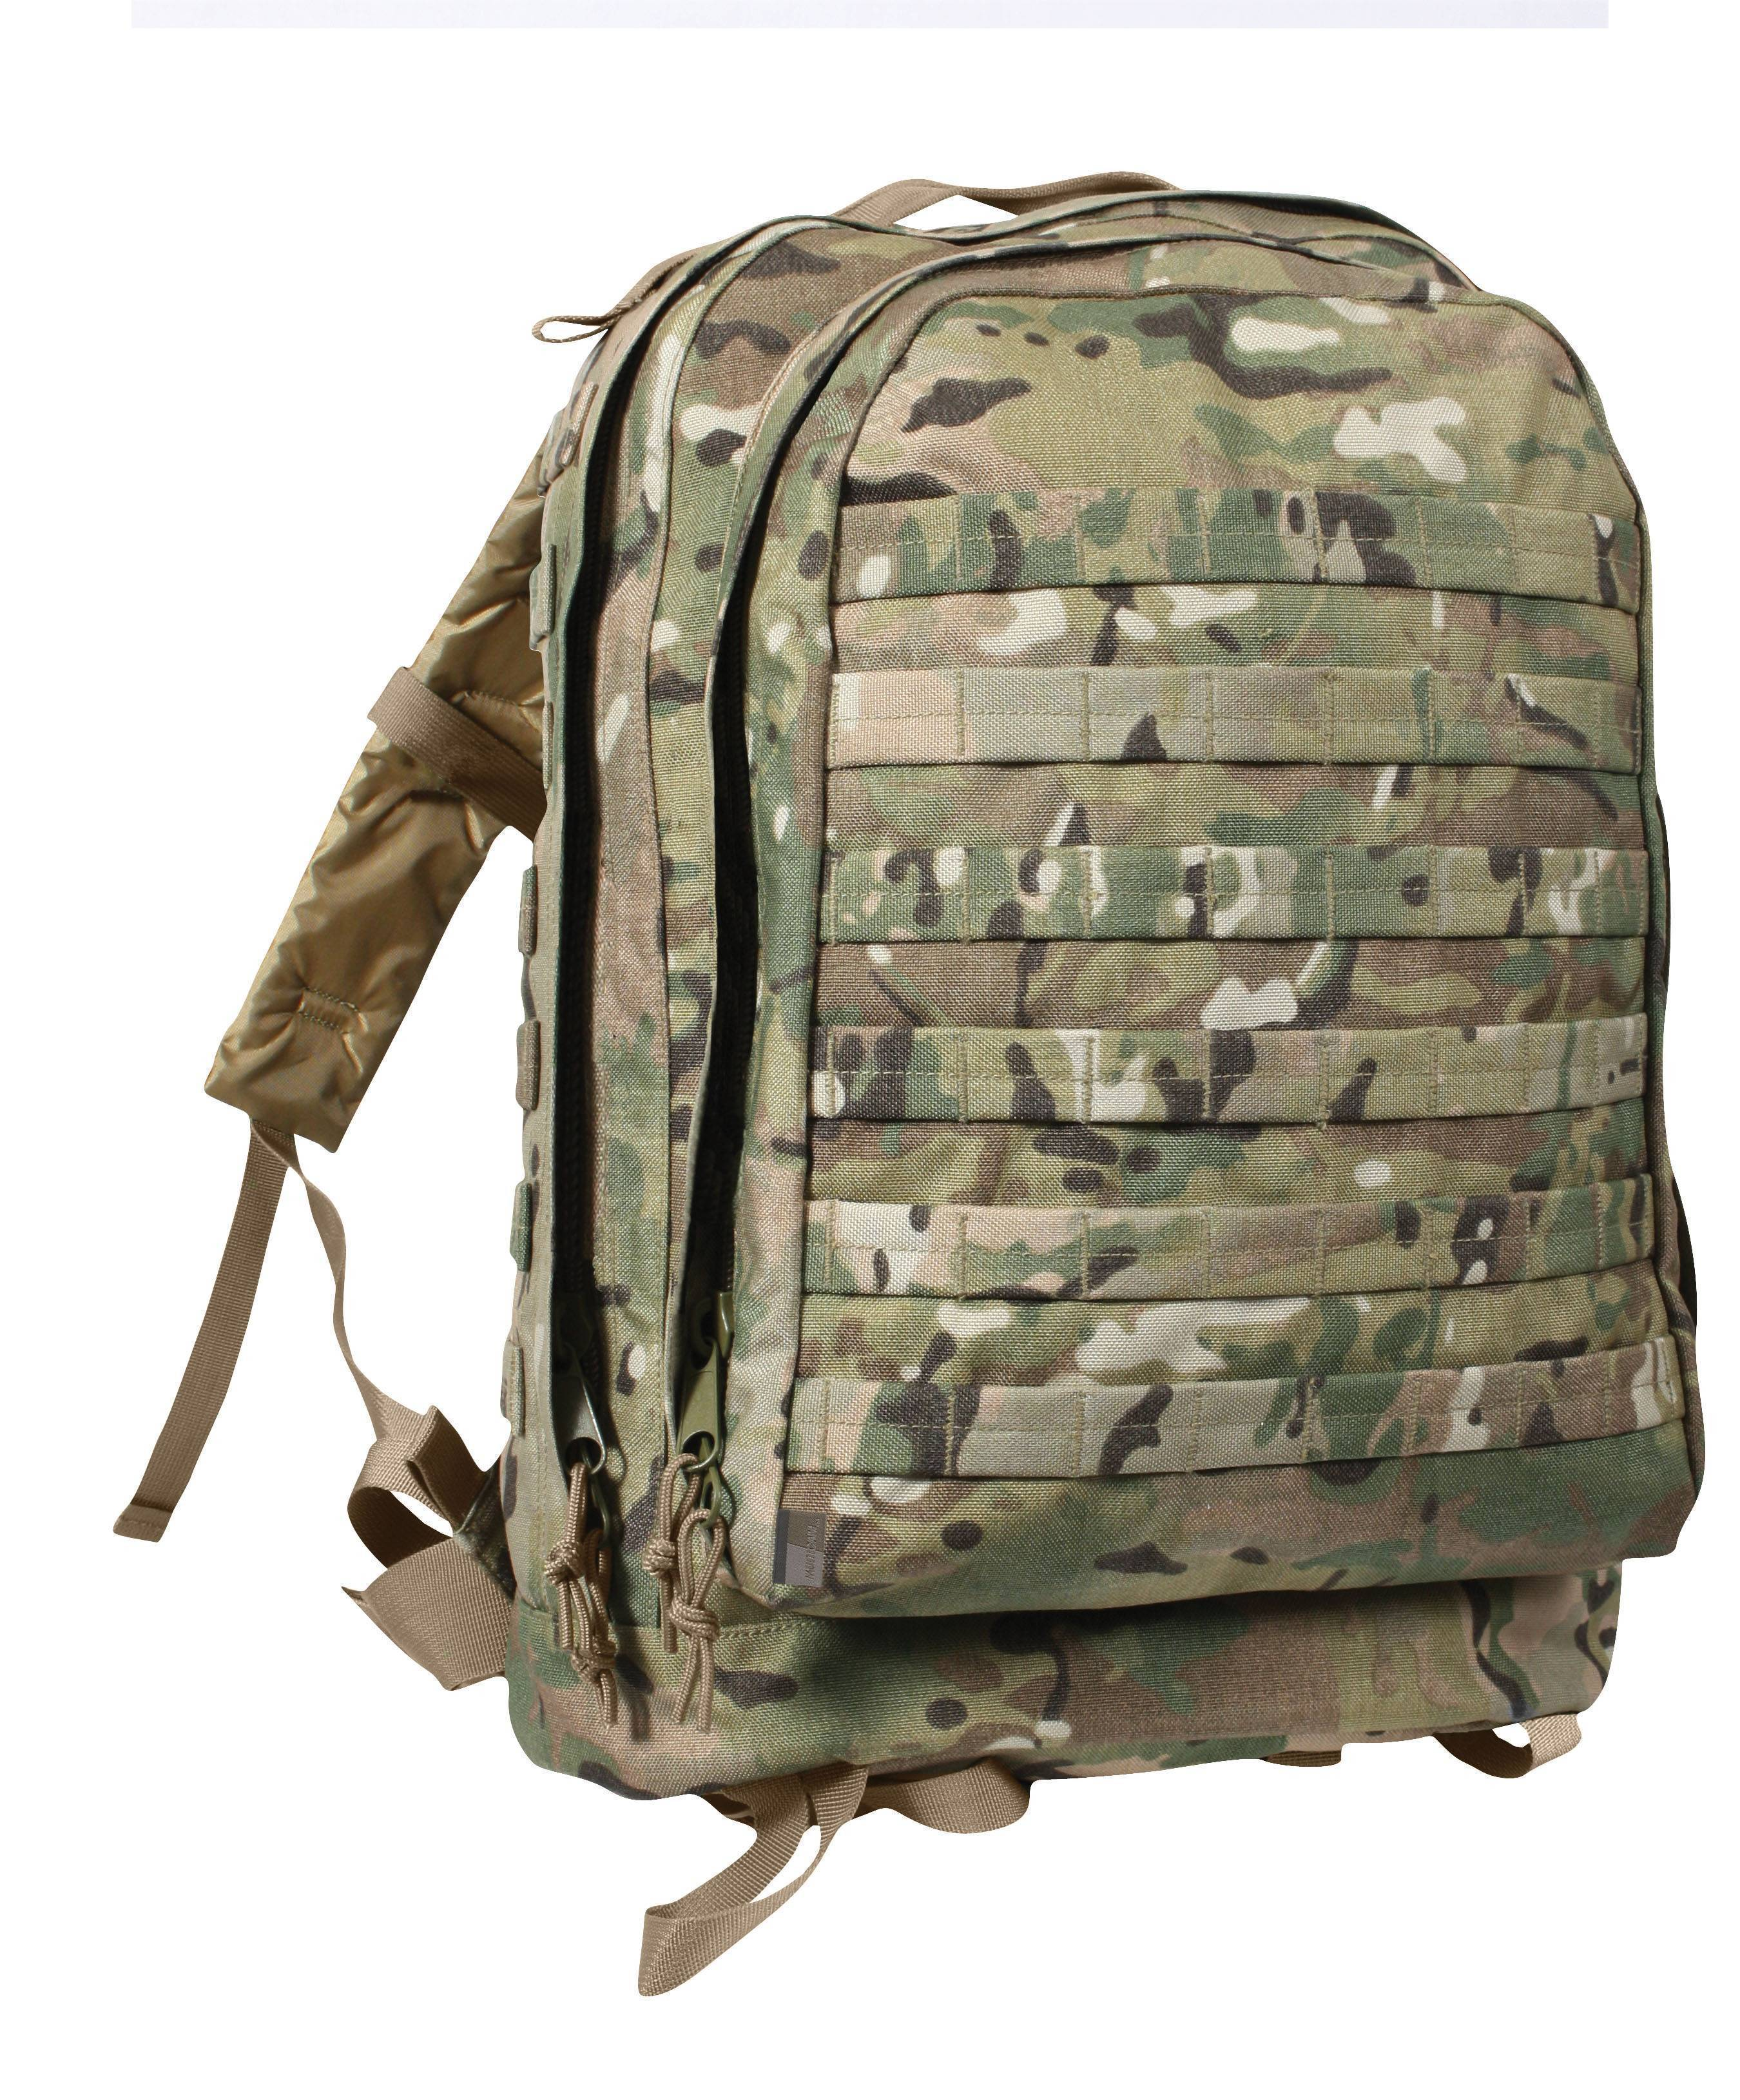 Тактический рюкзак Rothco MOLLE II 3-Day Assault Pack MultiCam 40125